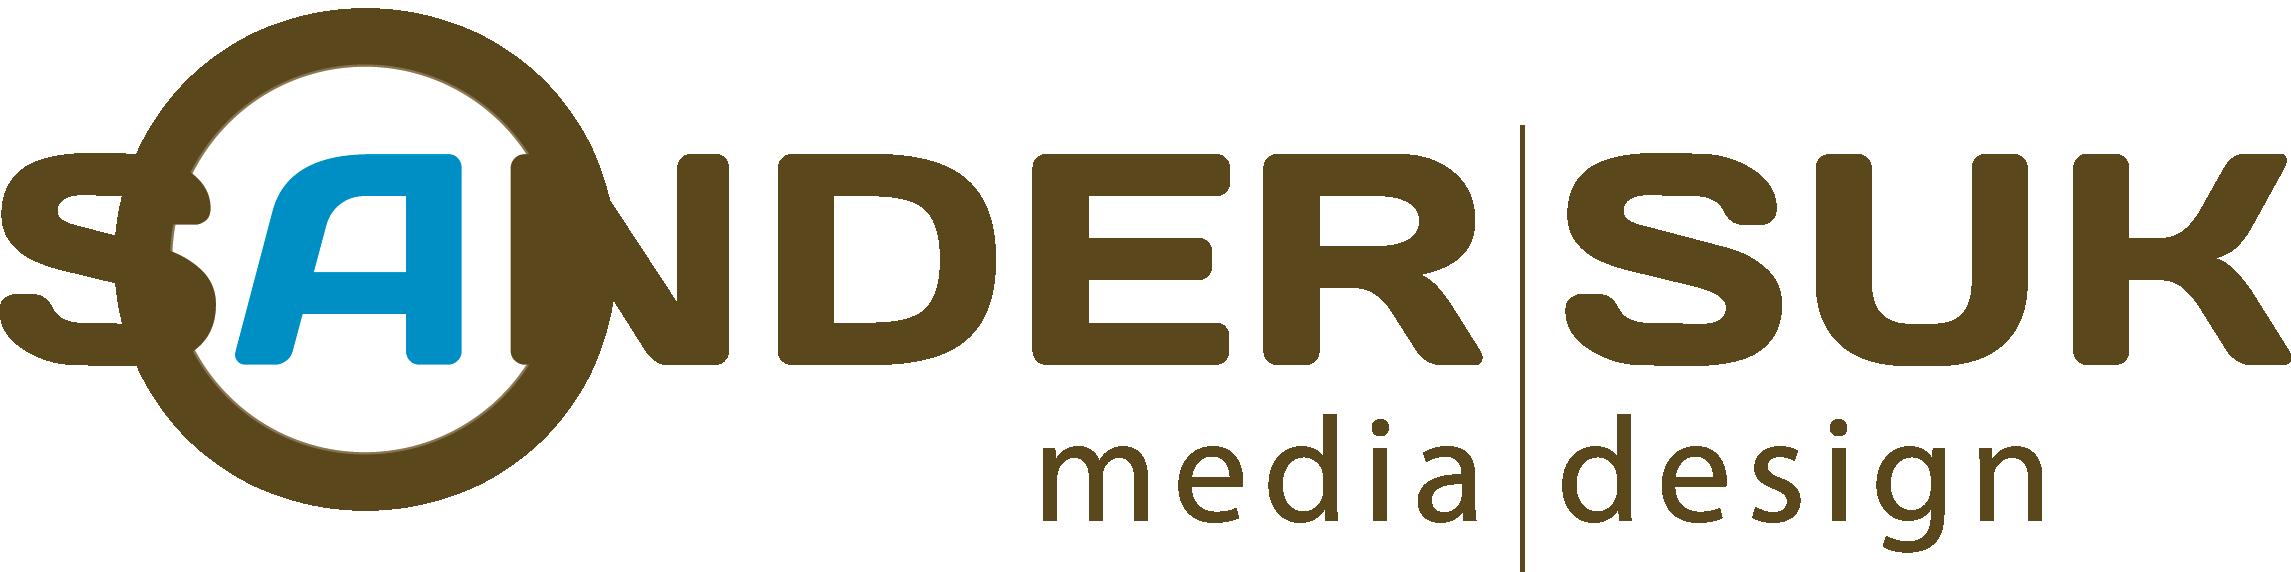 Sander Suk media design, ontwerper, DTP-er, Raerd, Friesland